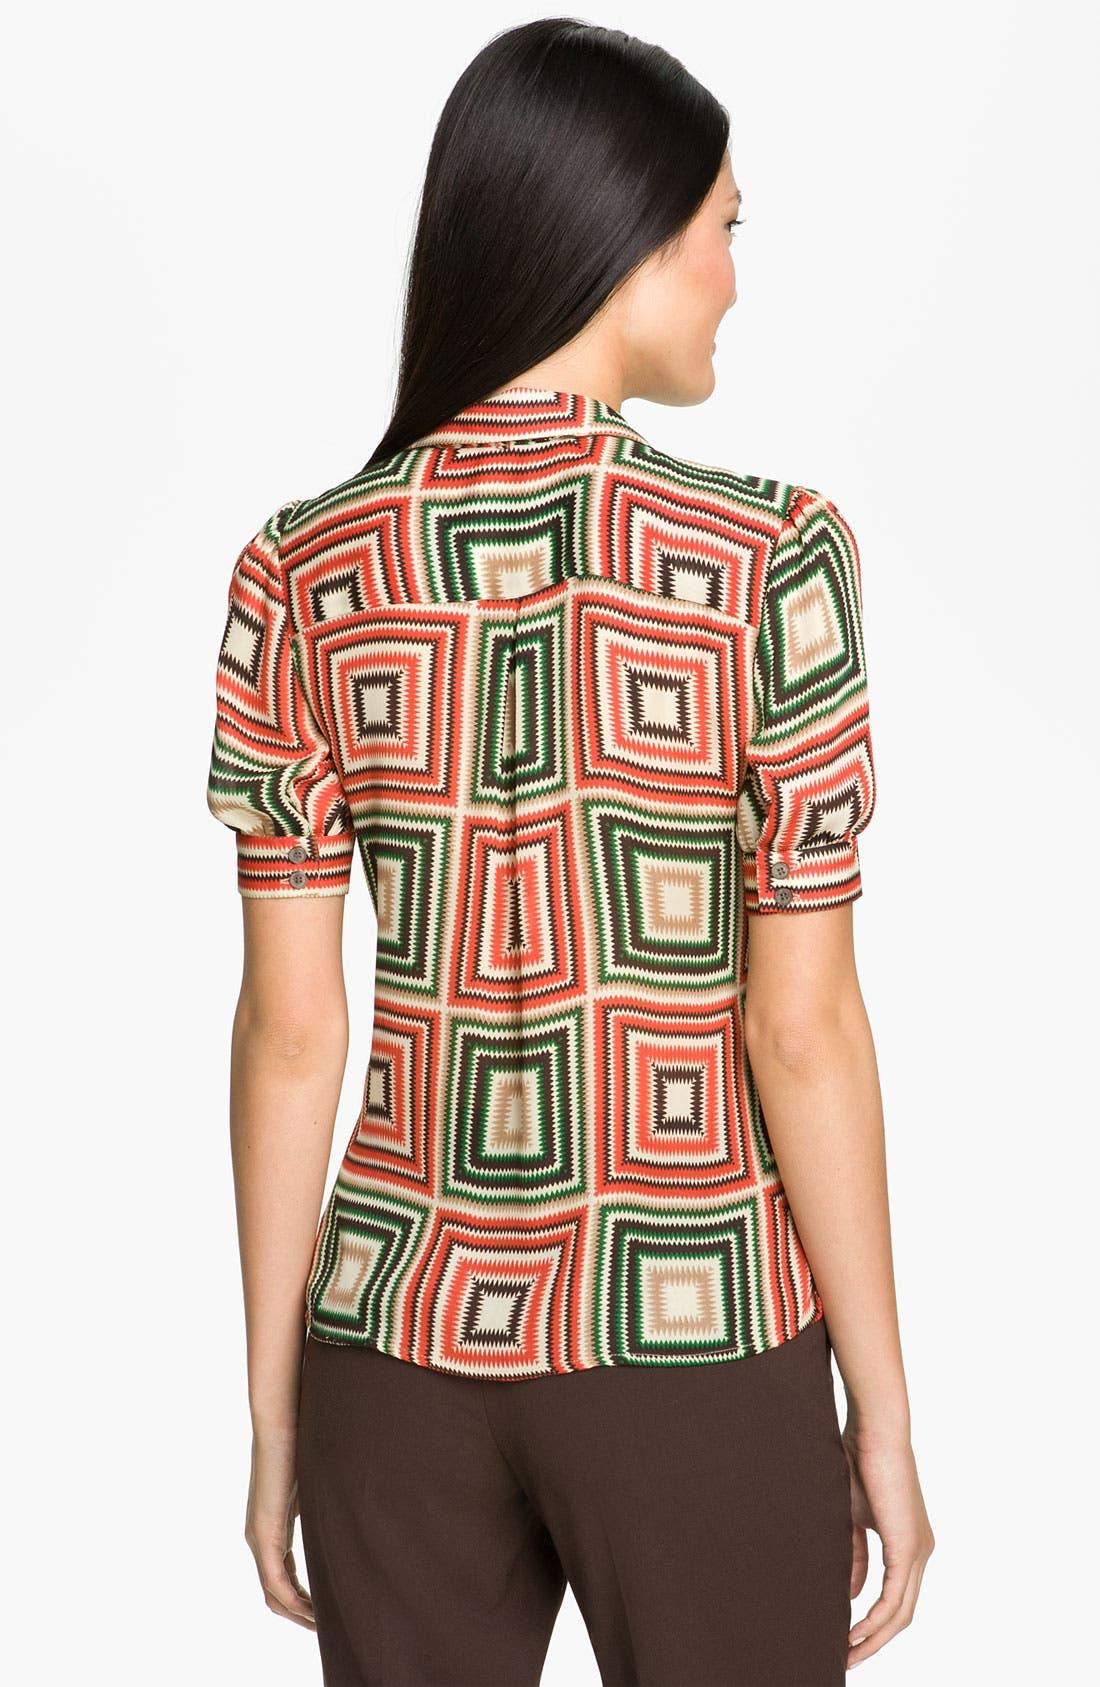 Alternate Image 2  - Vince Camuto Print Tie Neck Top (Petite)